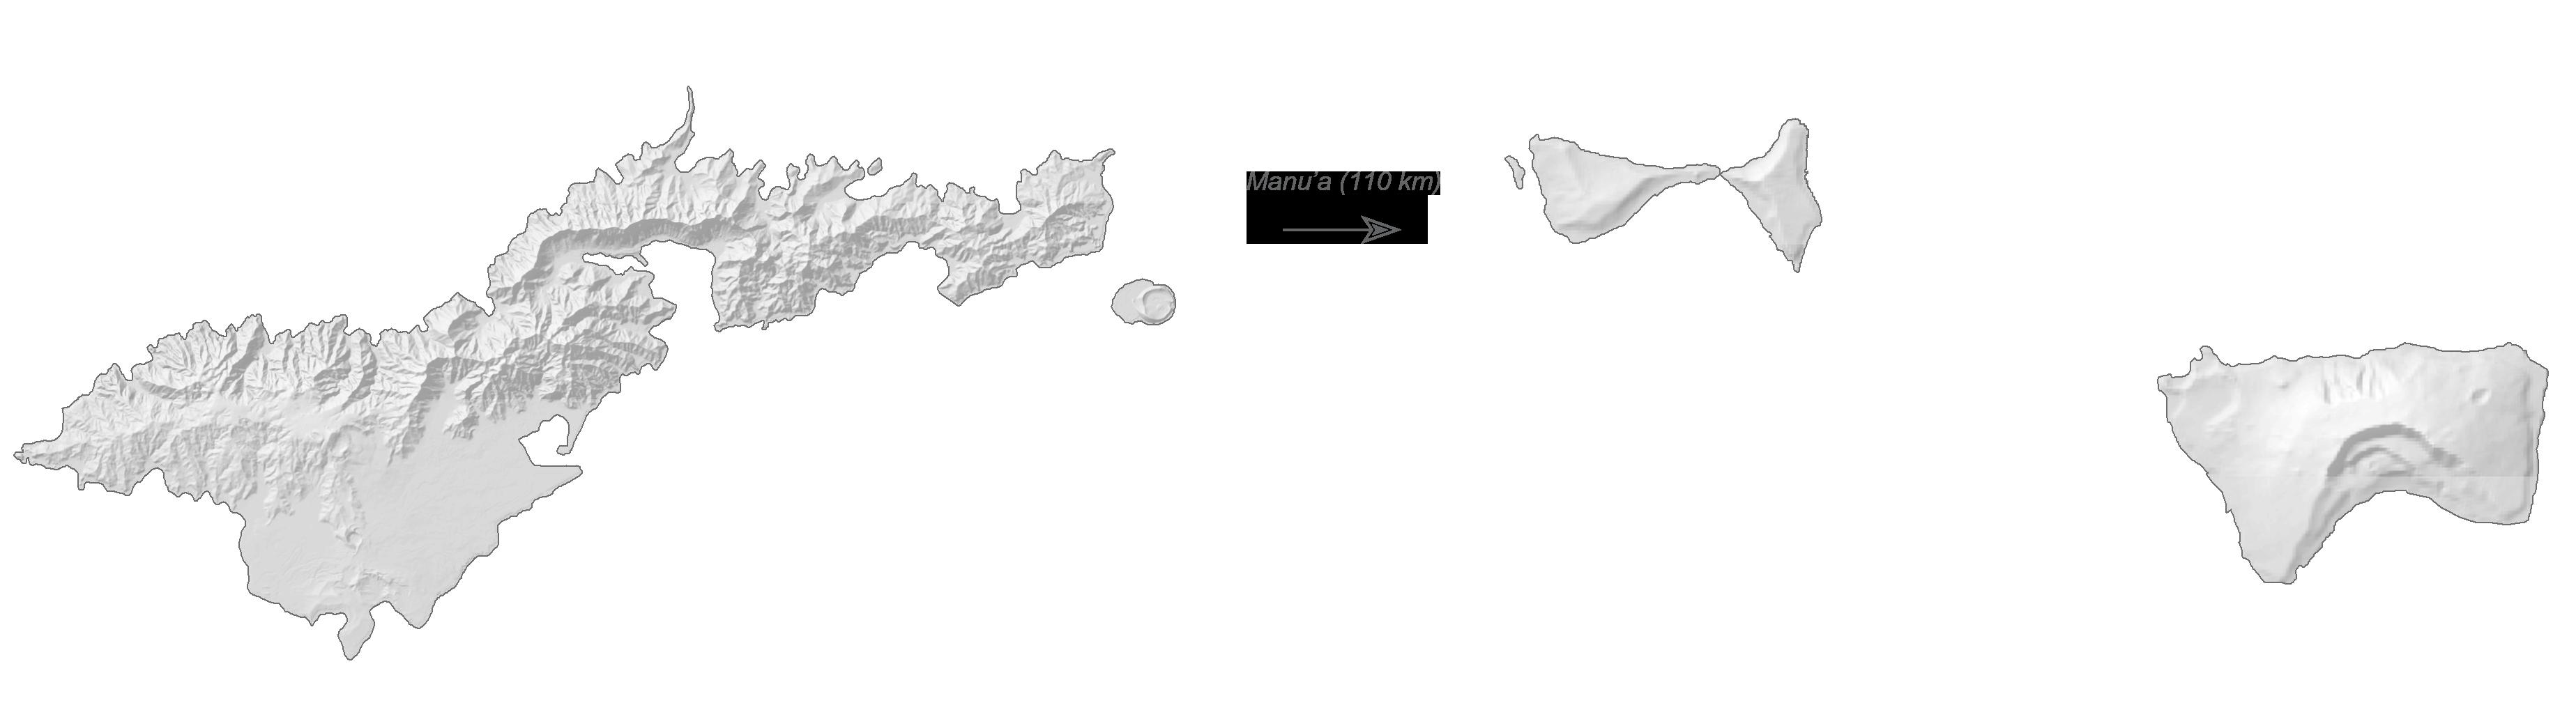 American Samoa Elevation Map